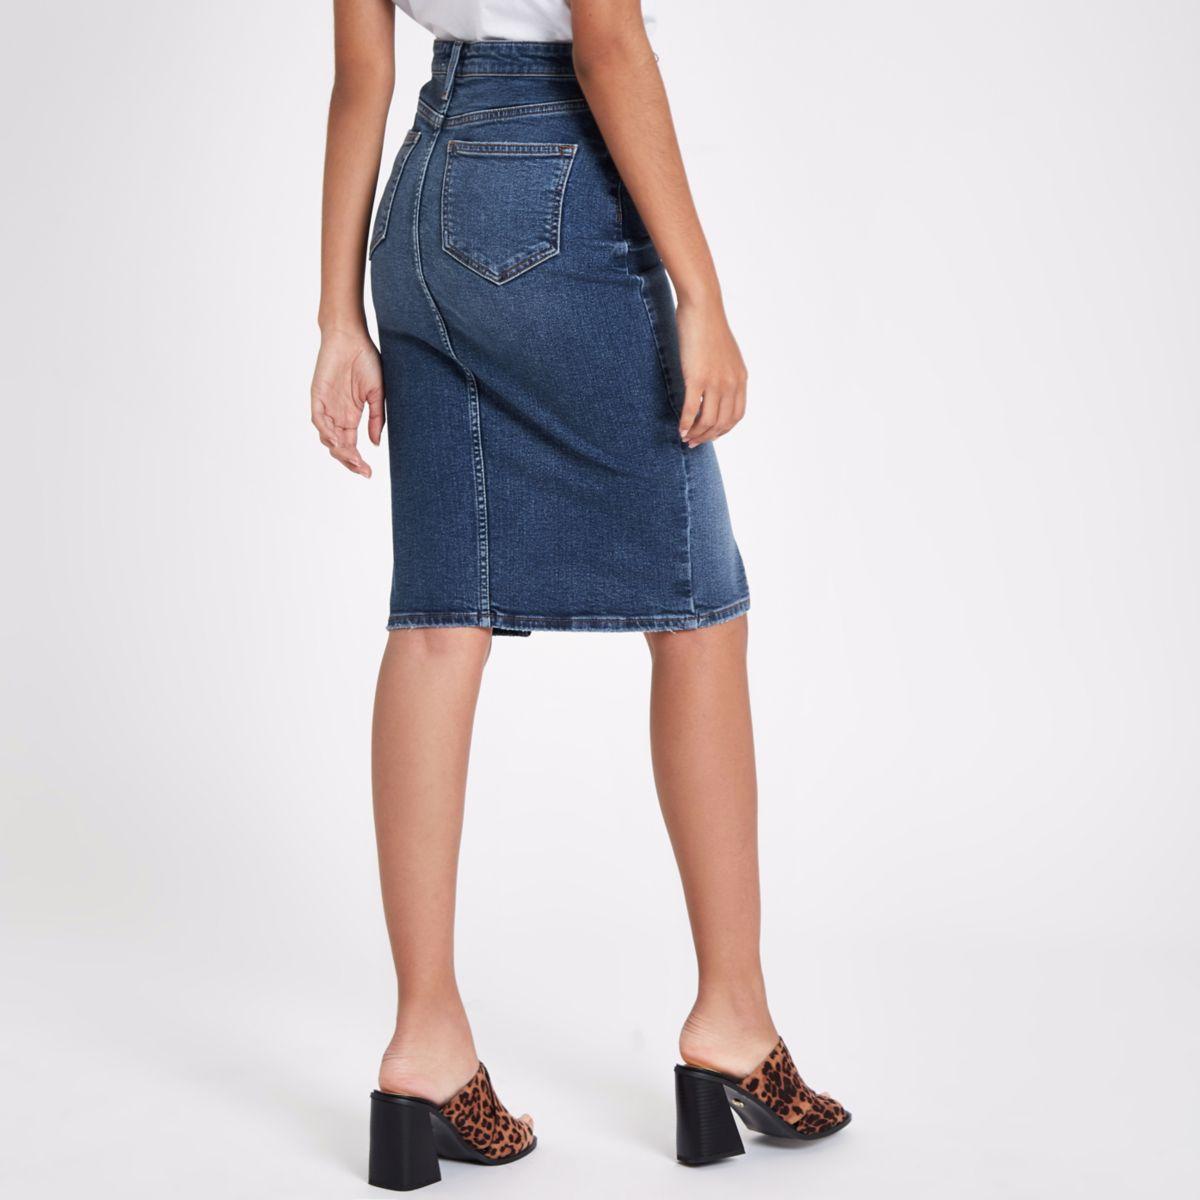 daaf1c74a Denim Pencil Skirt Shopstyle Uk   Huston Fislar Photography